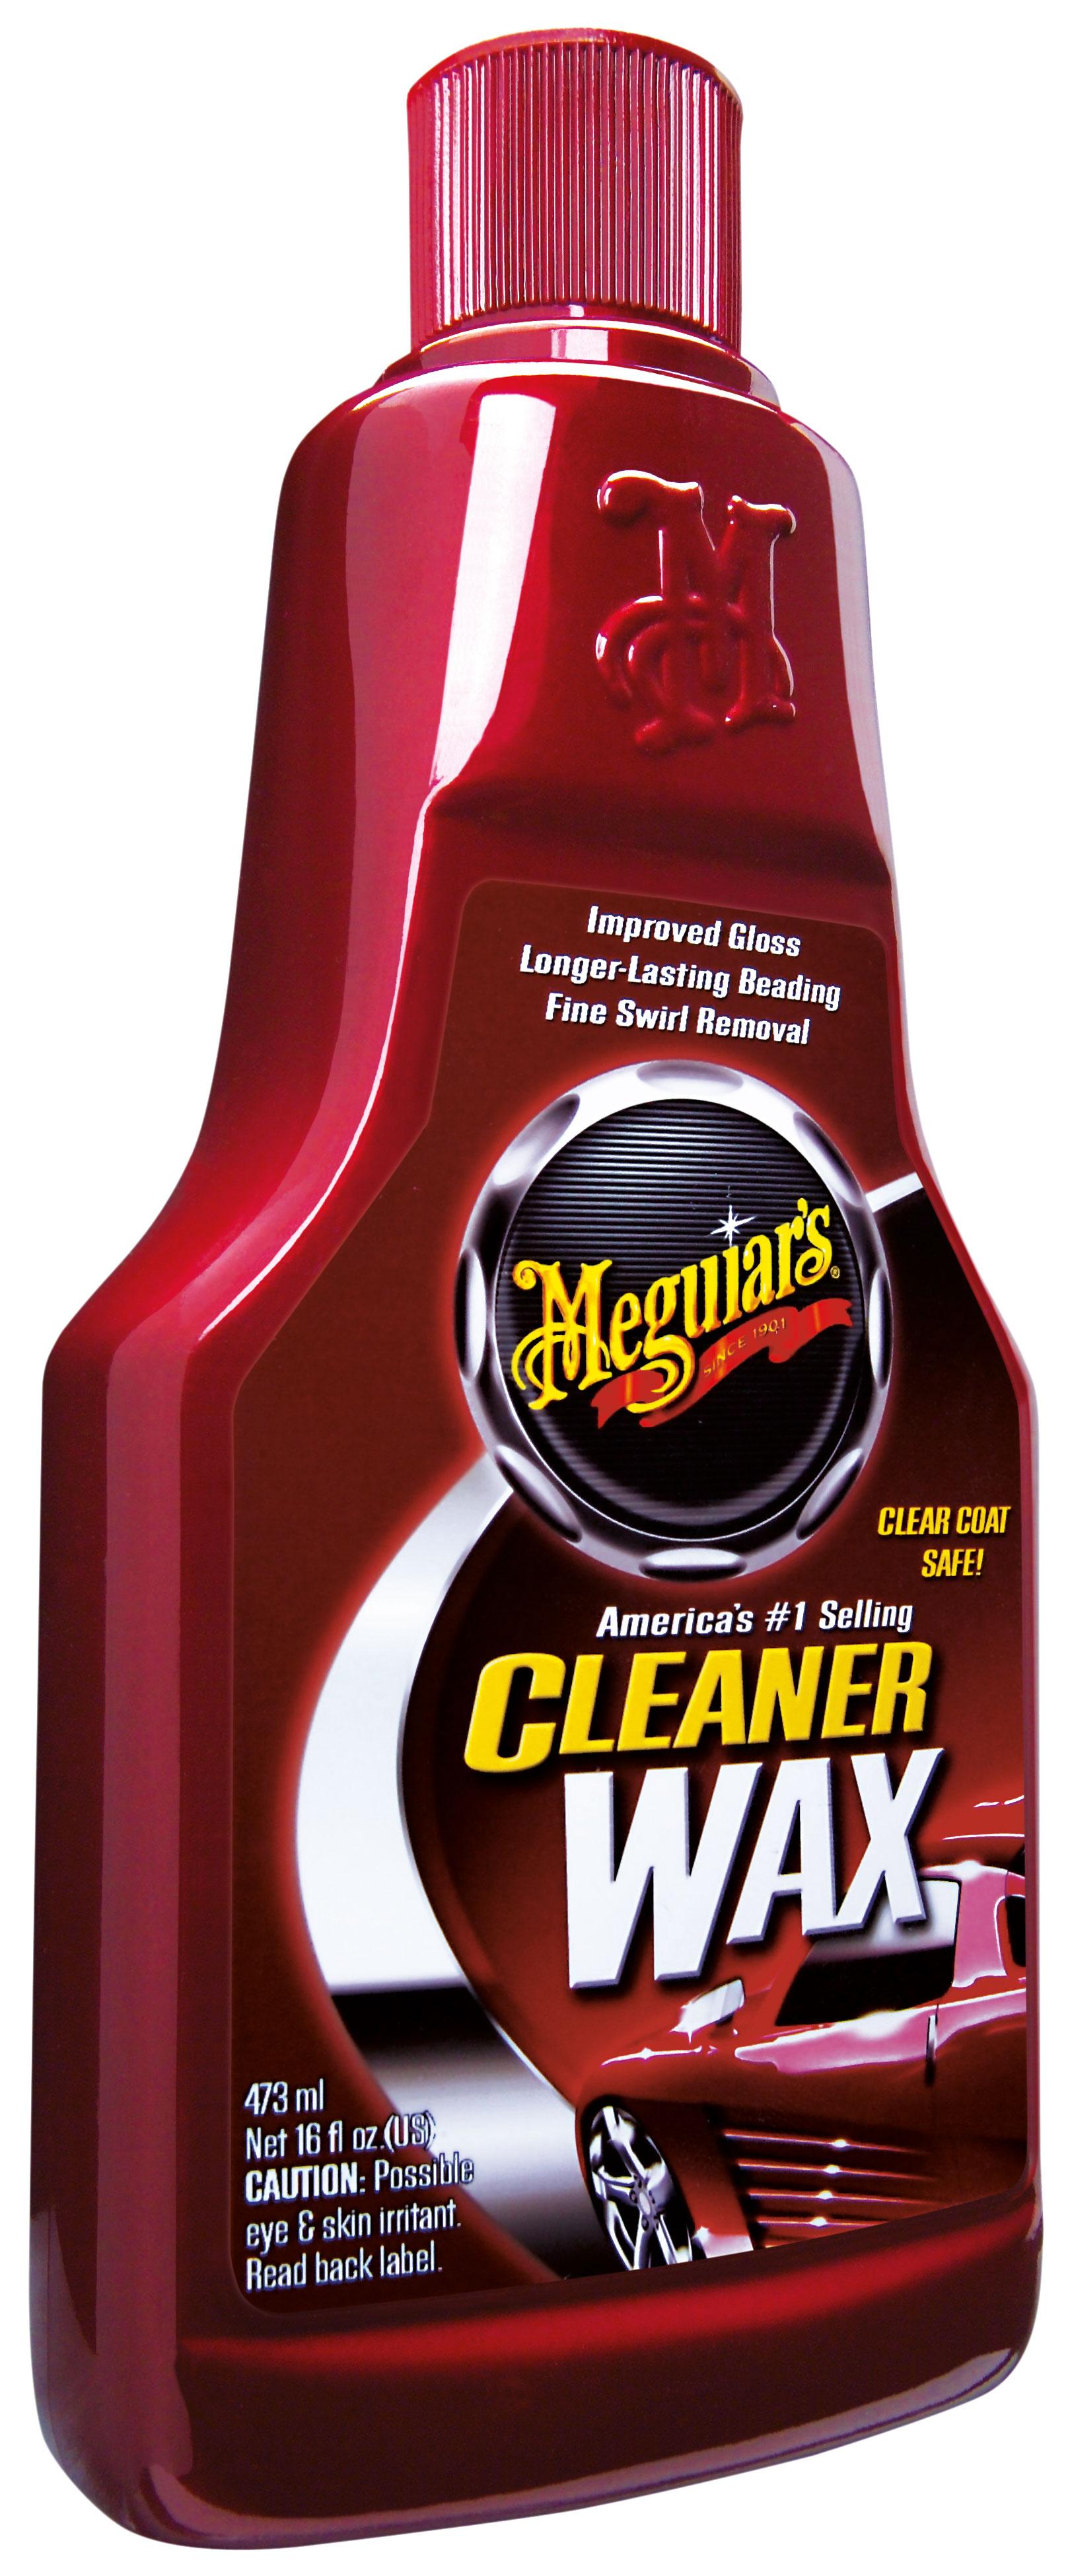 Meguiars Cleaner Wax Wachs Autowachs und Lackreiniger Liquid A1216EU 473ml